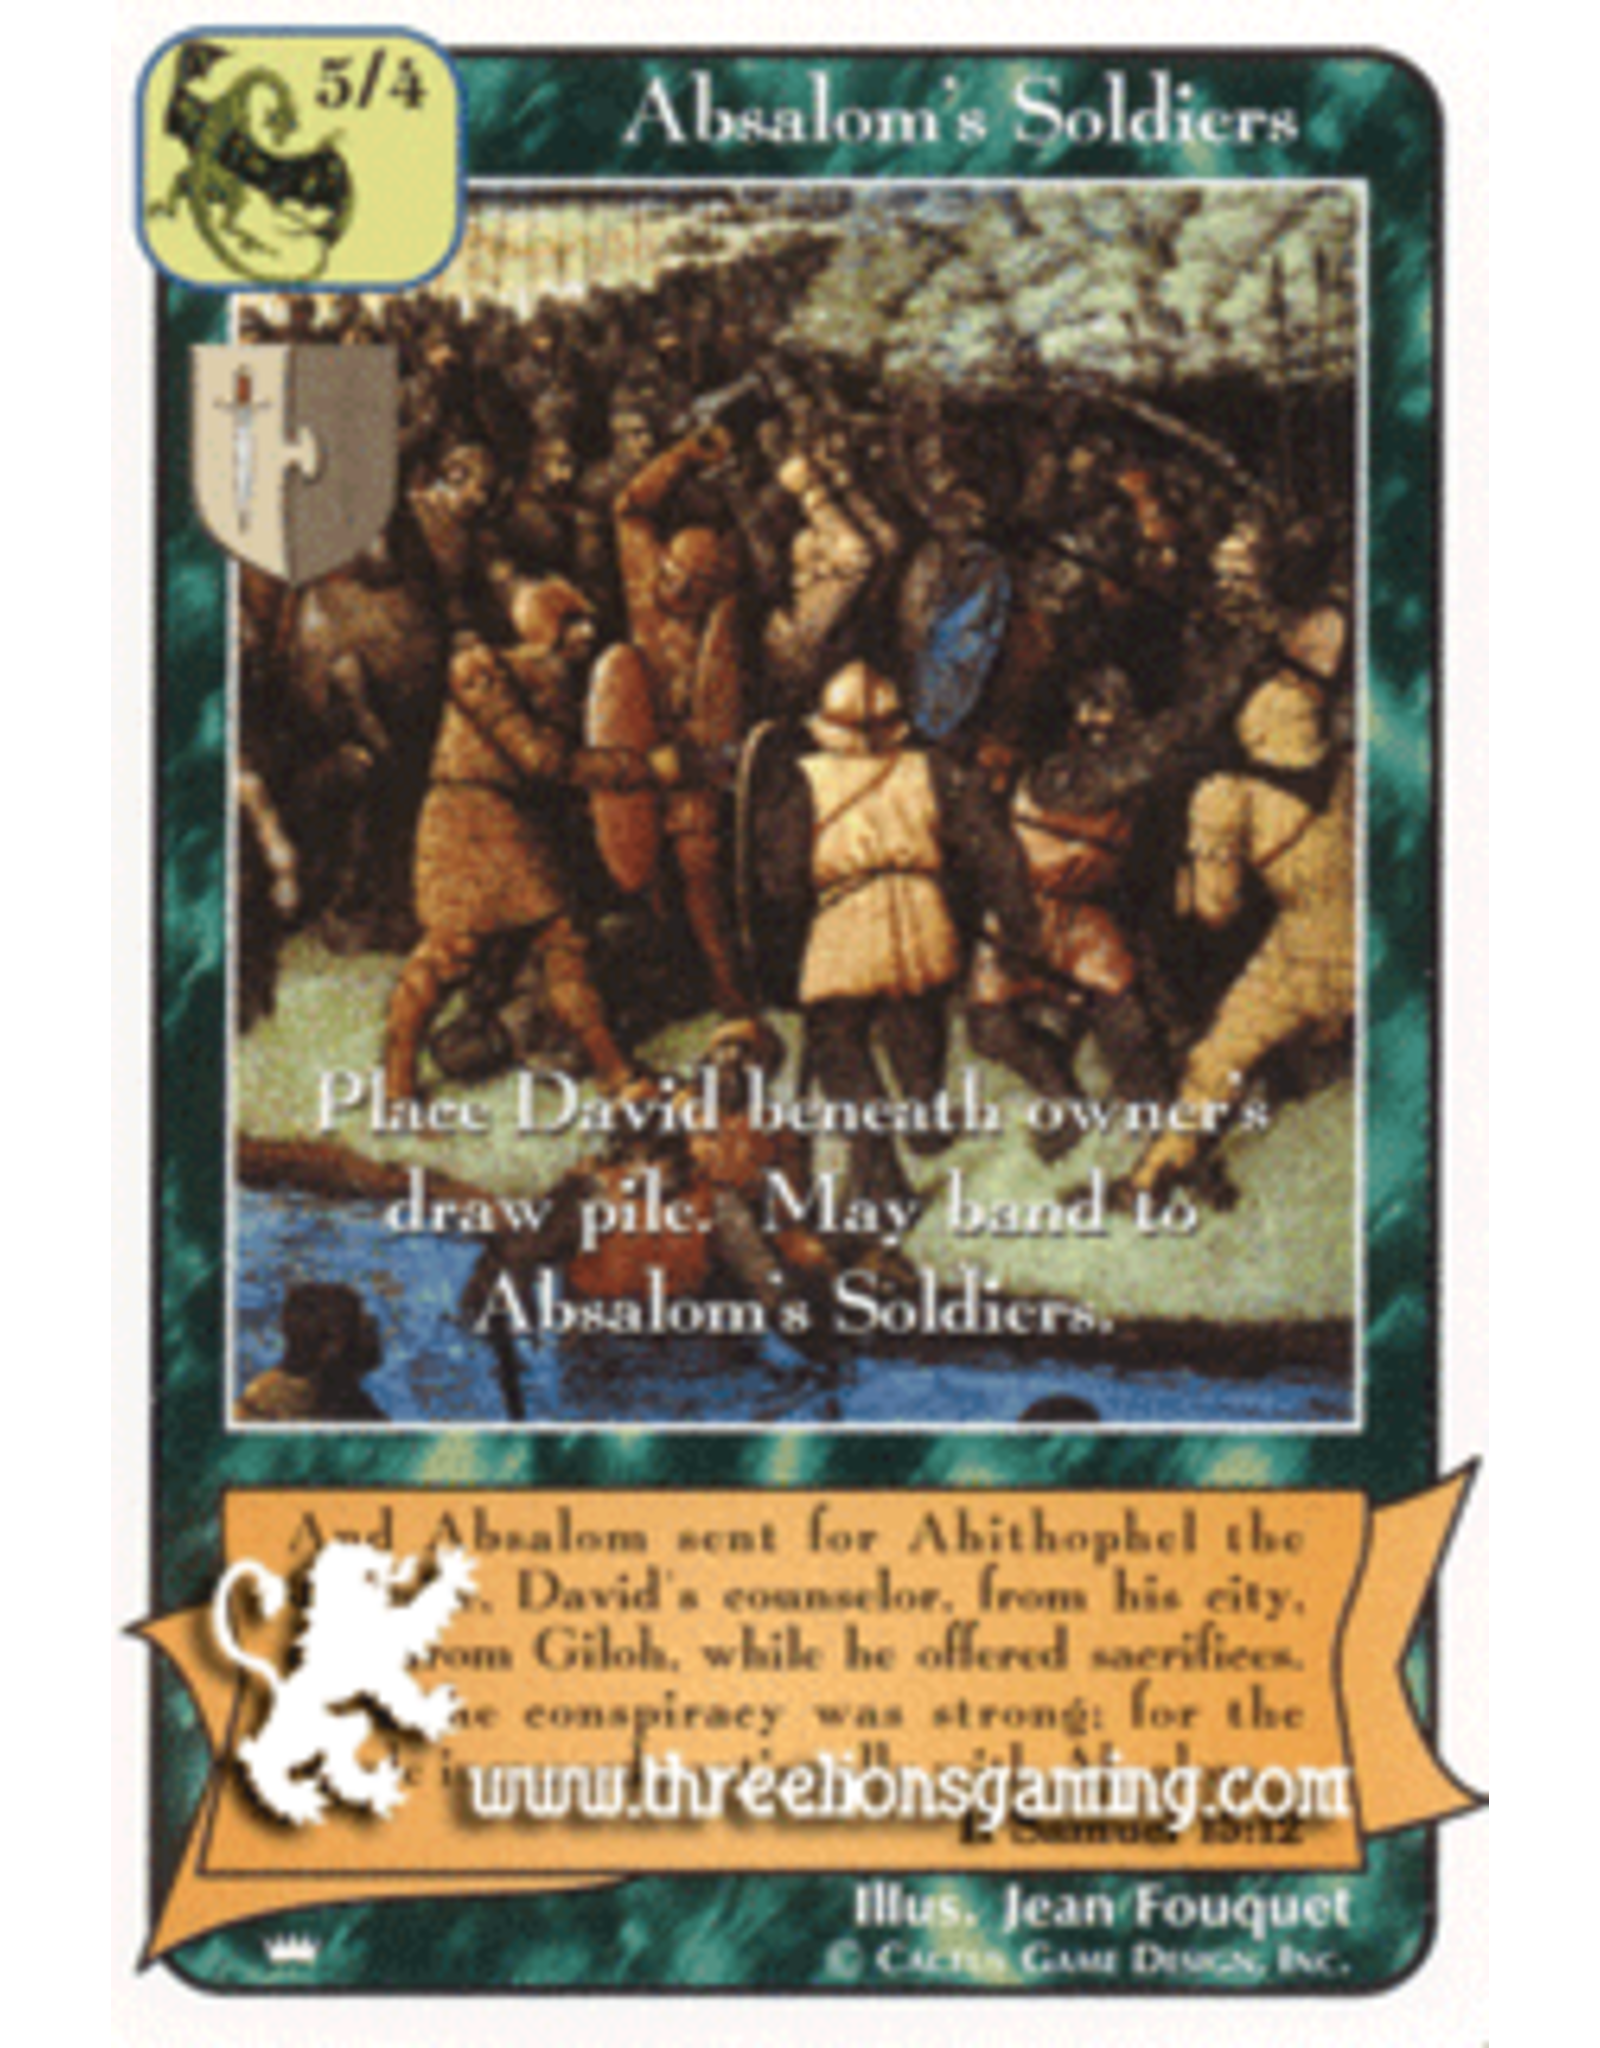 Absalom's Soldiers (Ki)